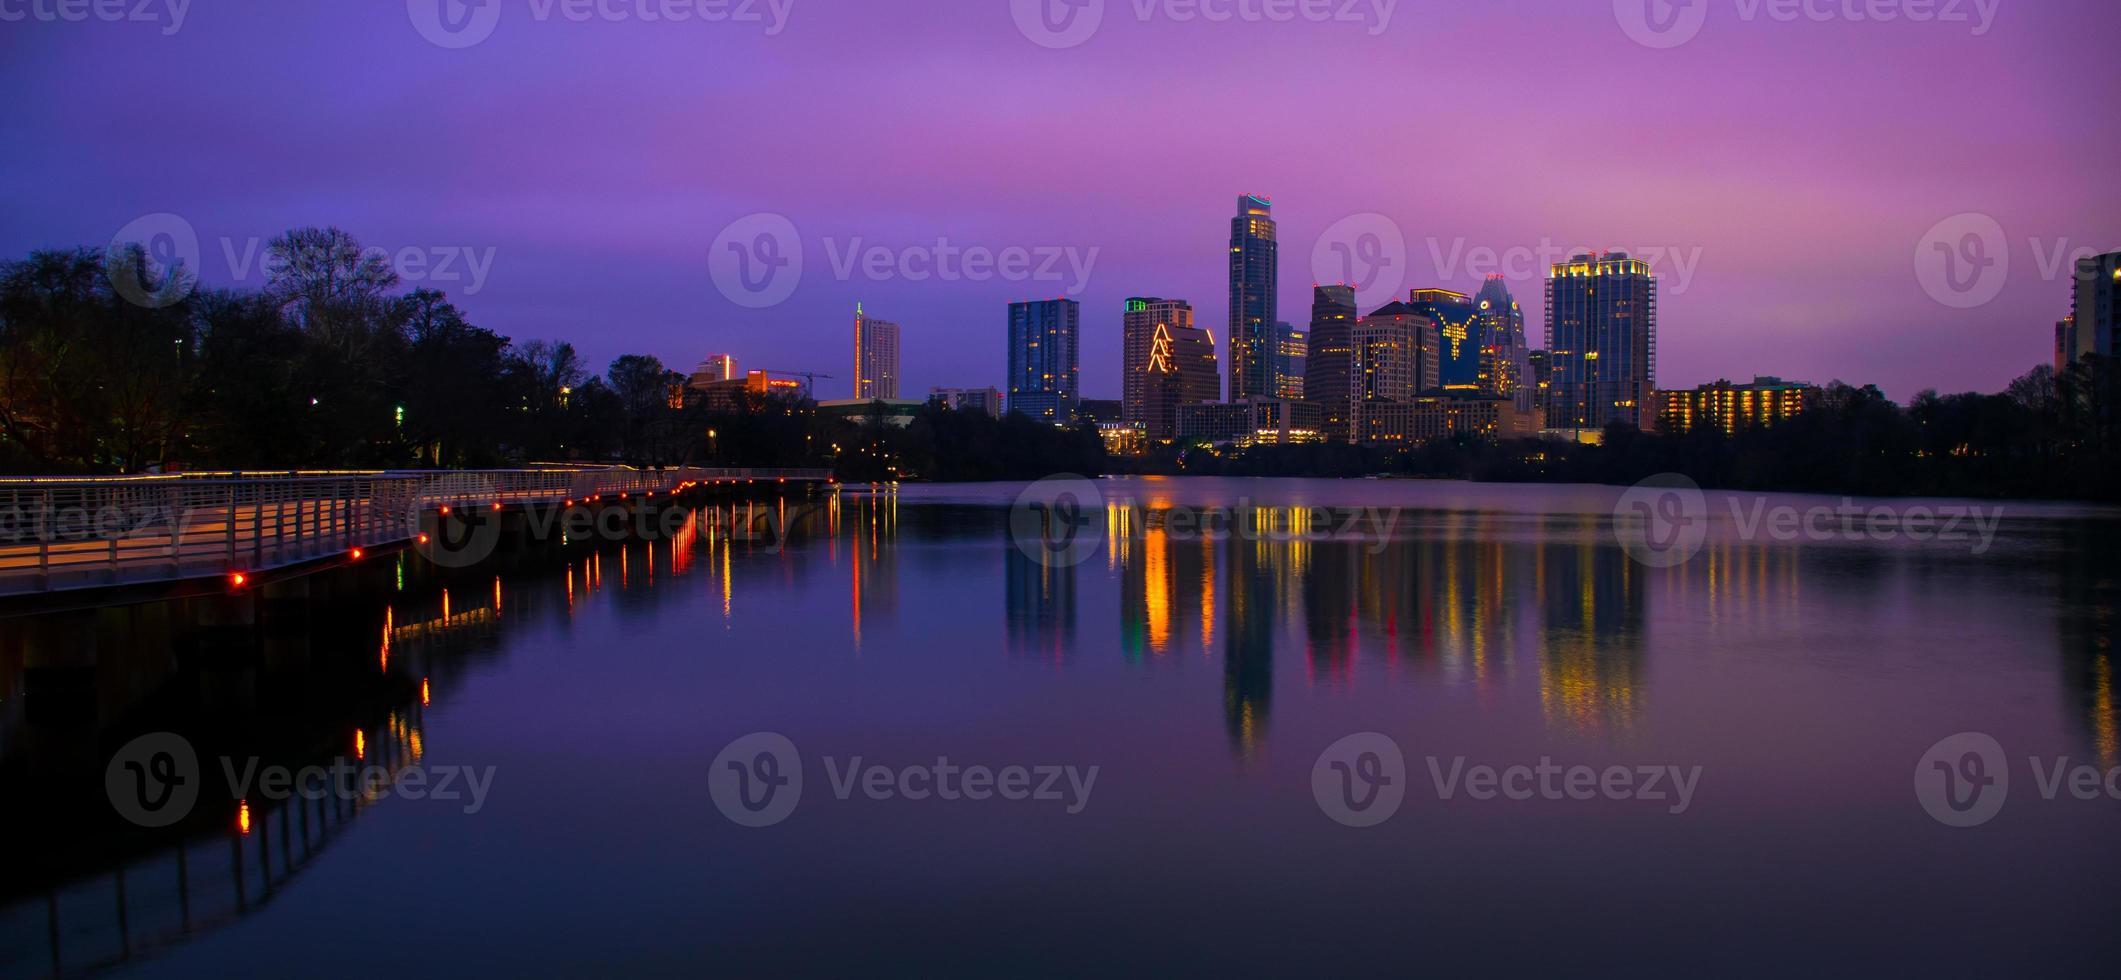 Wide Angle Night Time Austin Skyline Before Sunrise Reflections photo